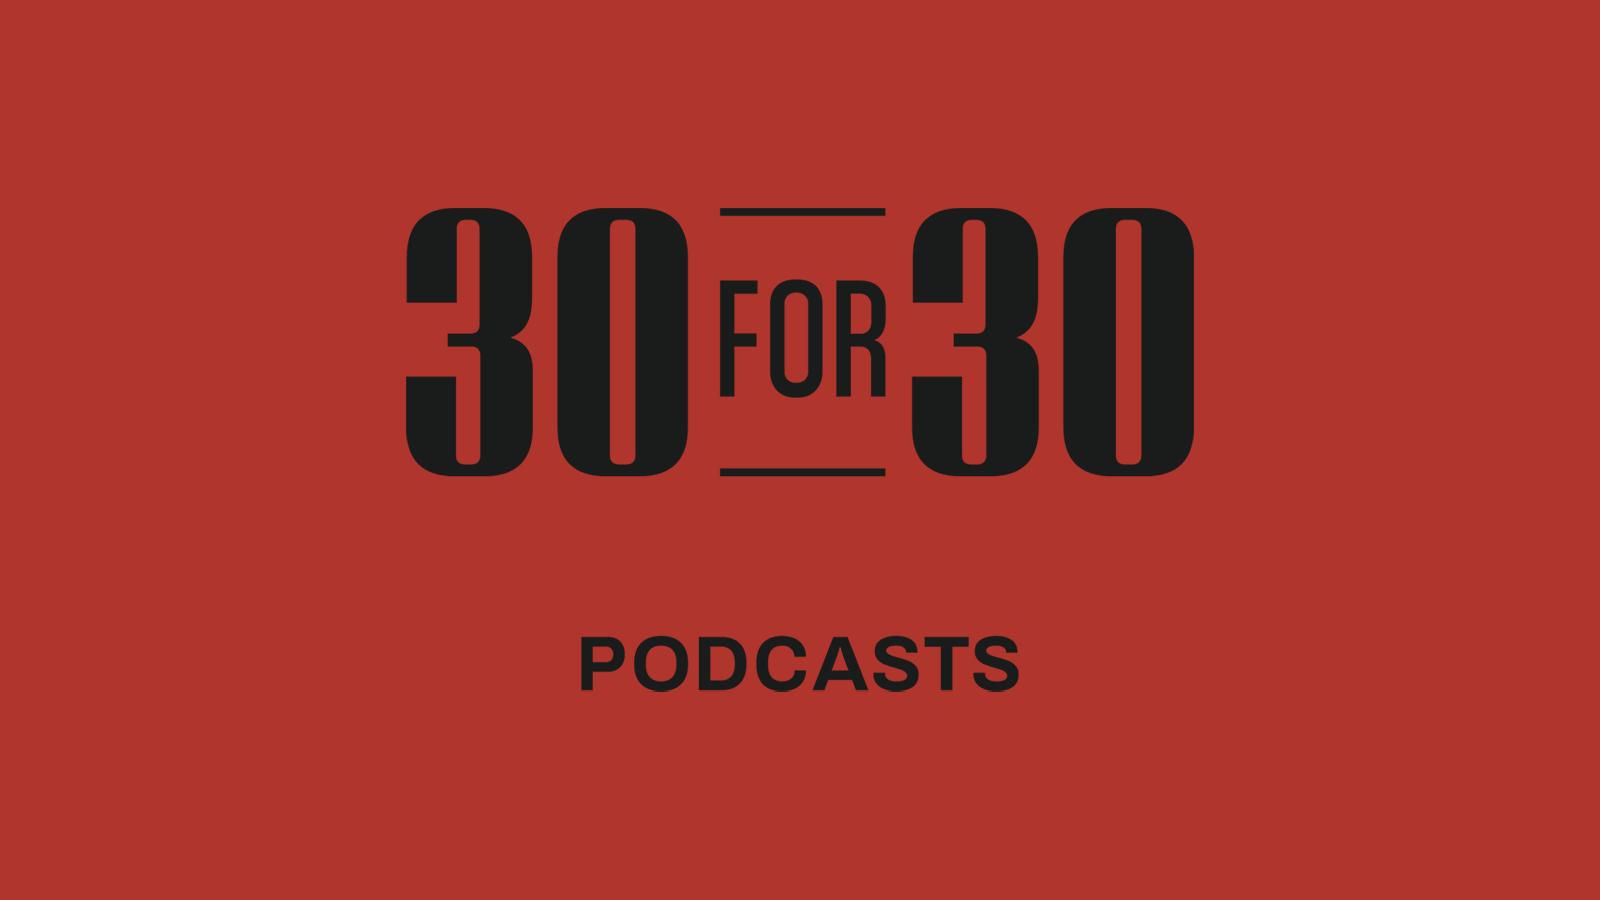 ESPNs 30 for 30 Podcasts Bikram Launch Party